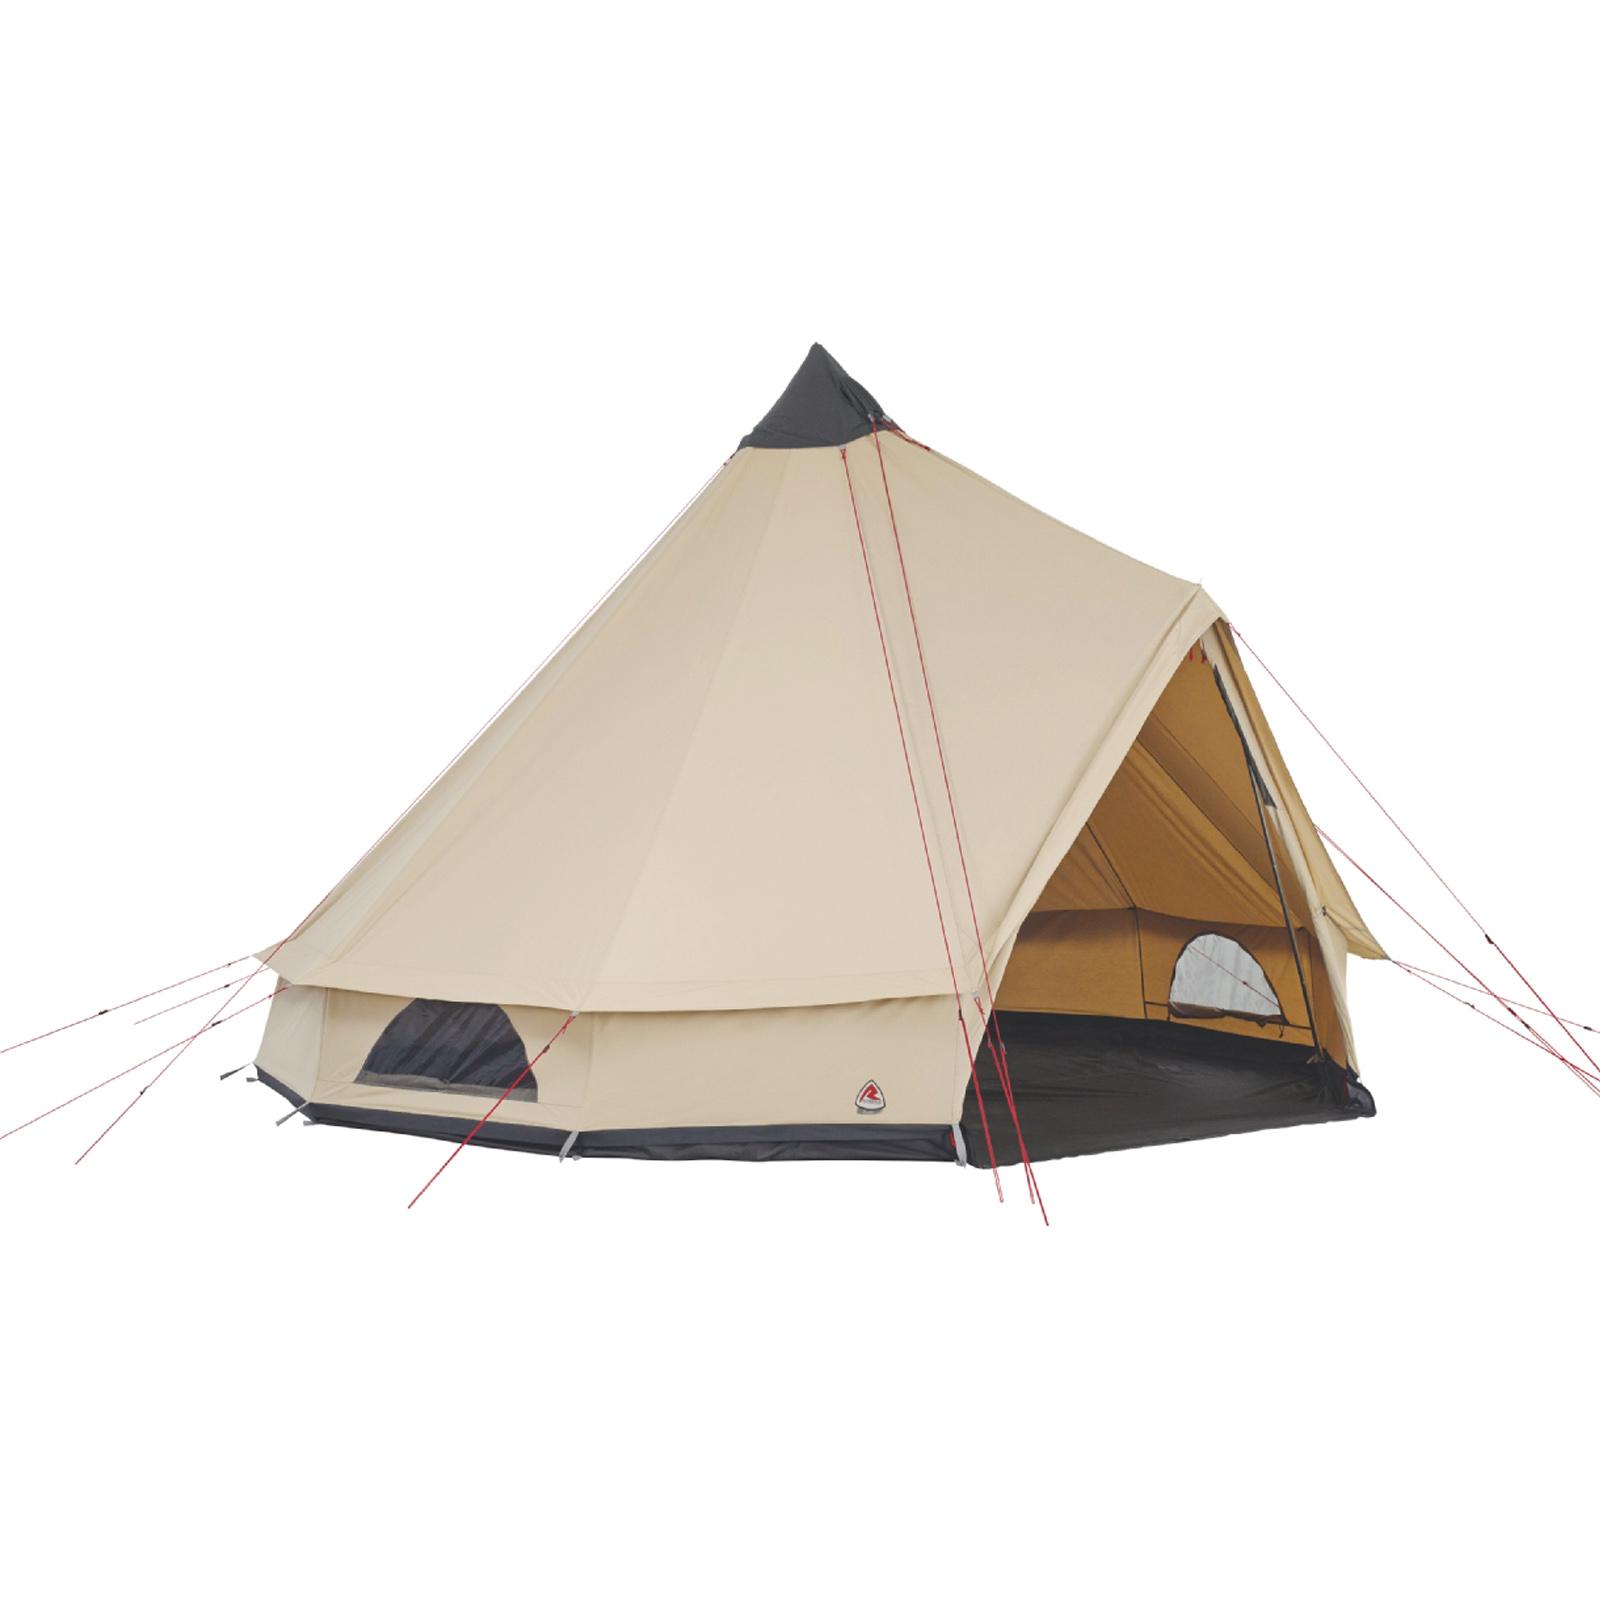 Zelt Aus Baumwolle : Robens klondike tipi gruppenzelt camping zelt baumwolle